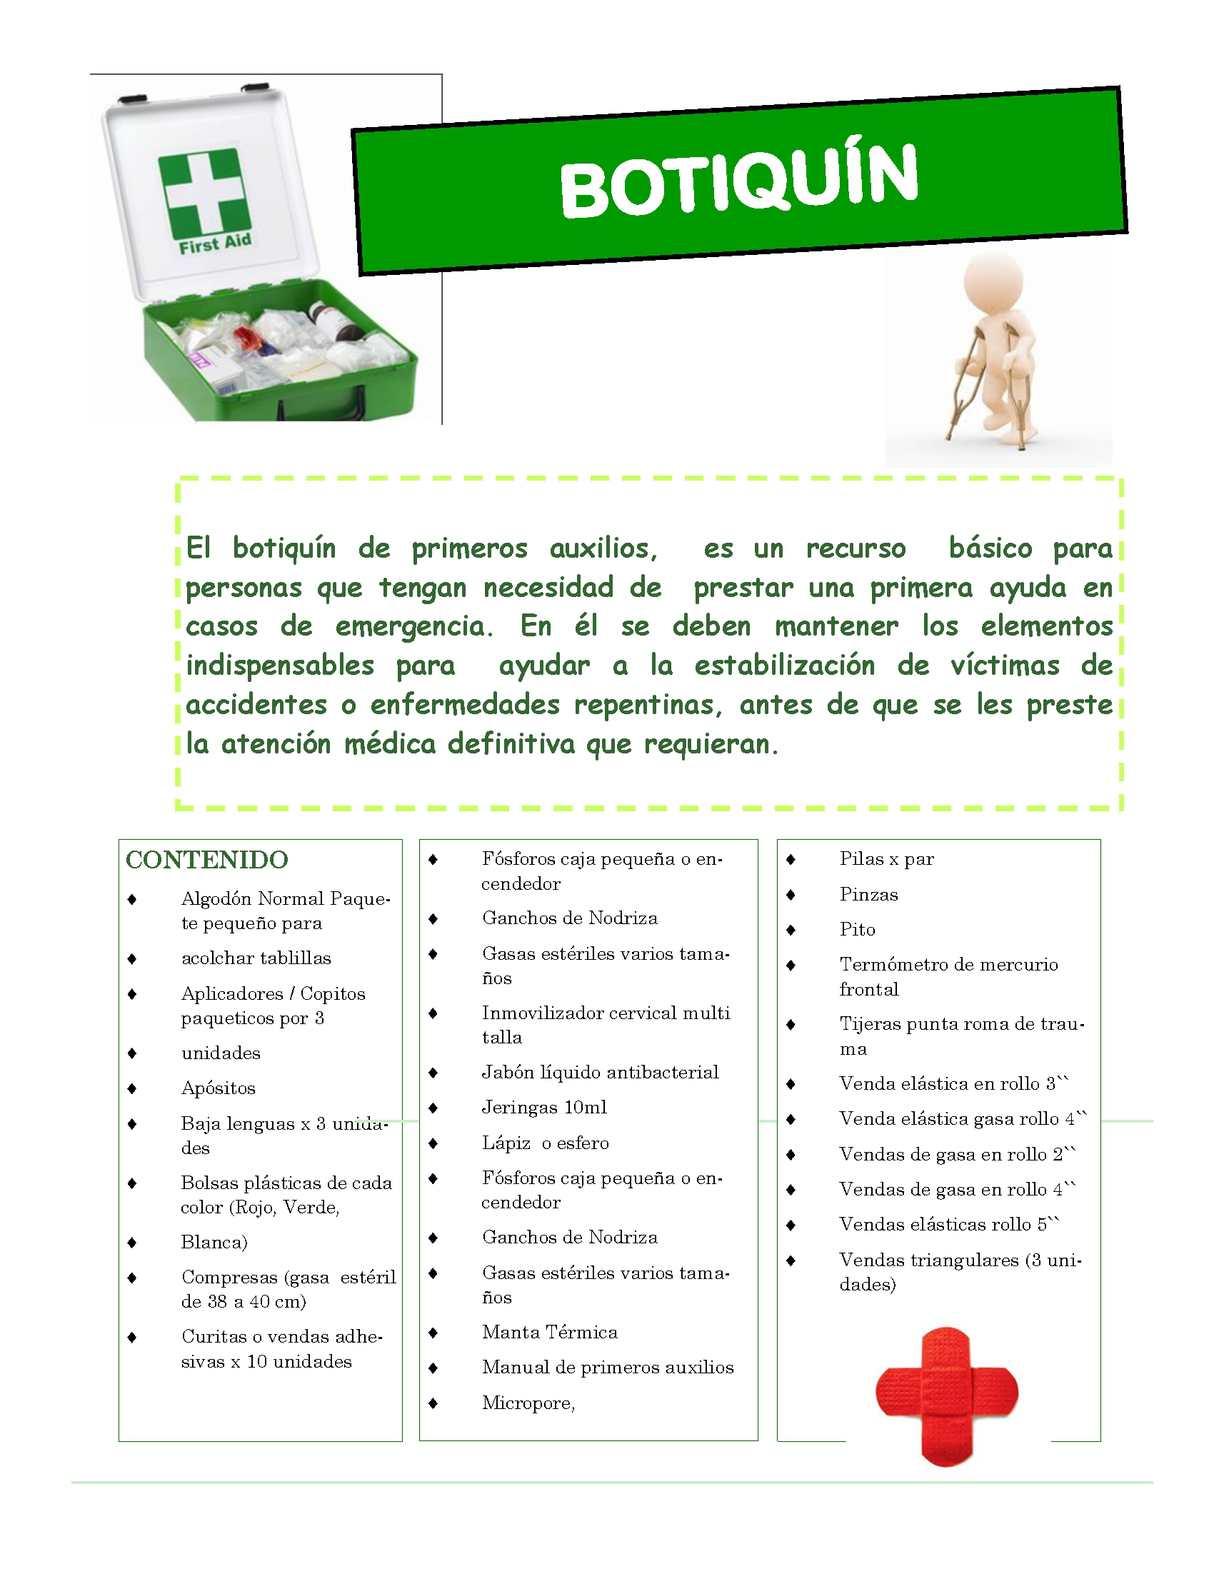 Manual de primeros auxilios - CALAMEO Downloader